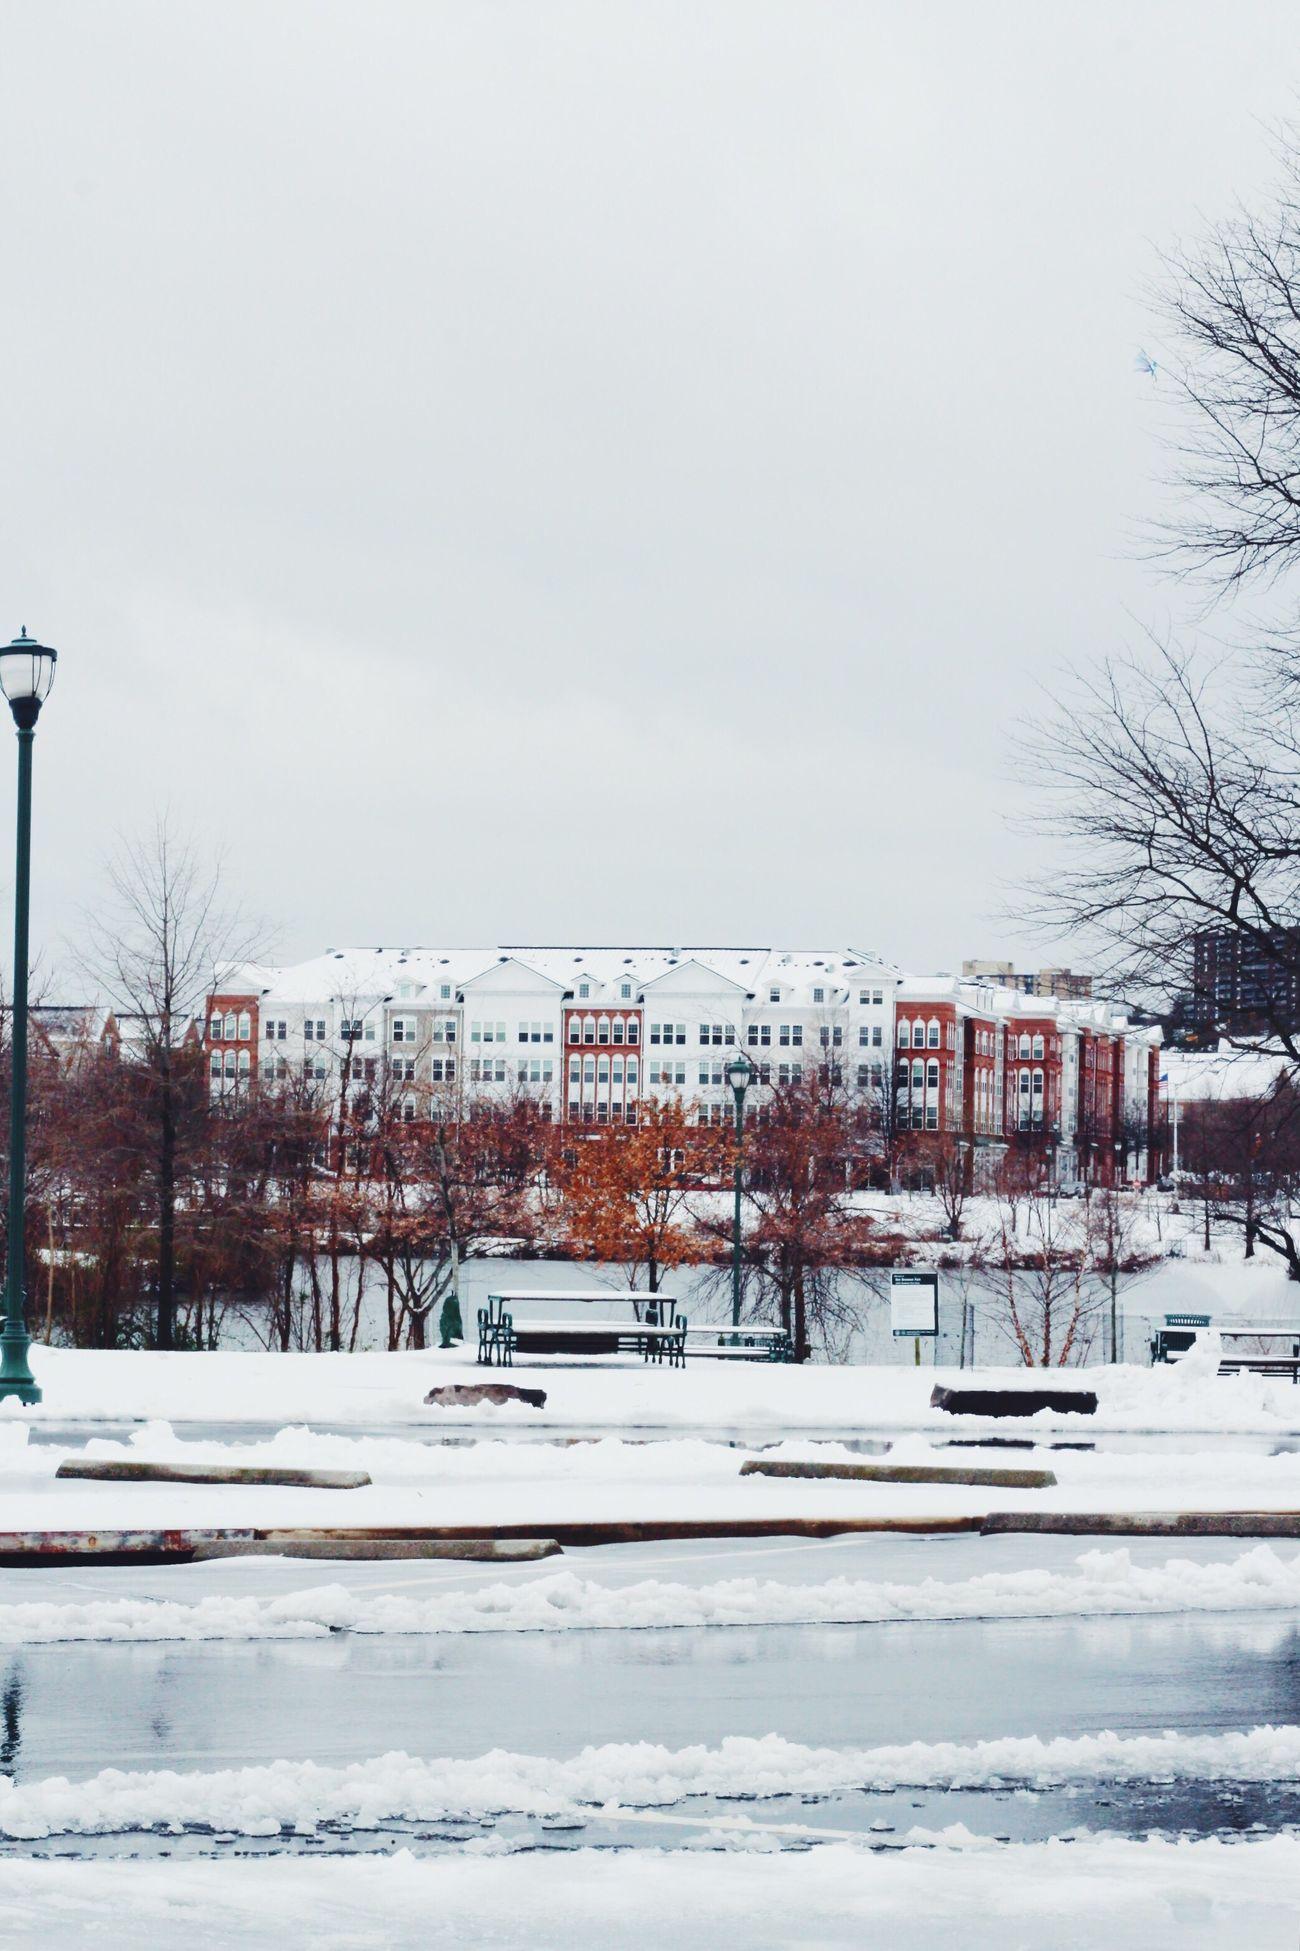 Winter Snow Outdoors City Nature Architecture Virginia East Coast EyeEm Best Shots - Landscape Landscape_Collection